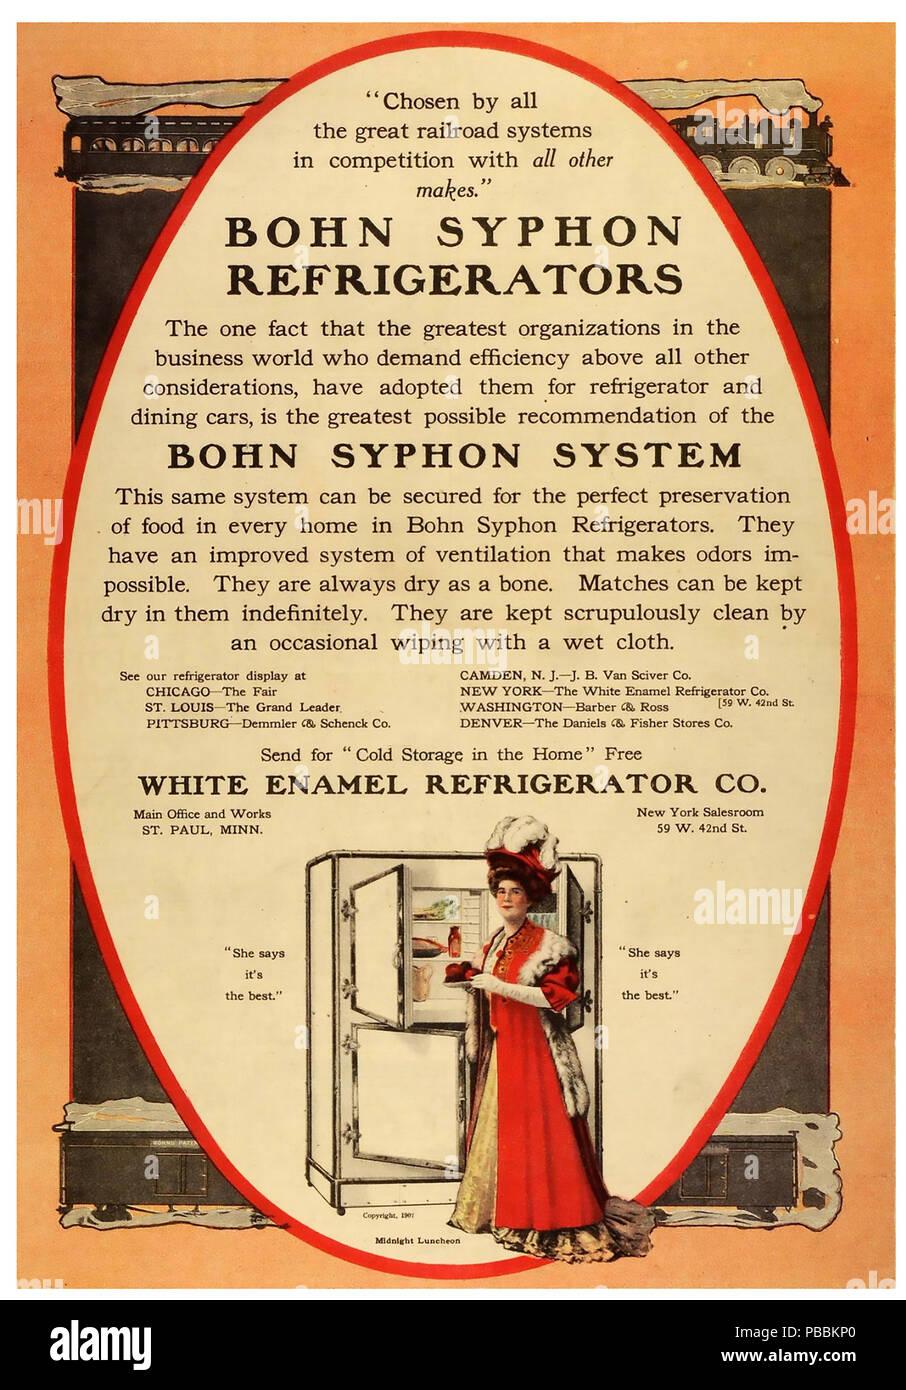 AMERICAN REFRIGERATOR ADVERT  1919 - Stock Image